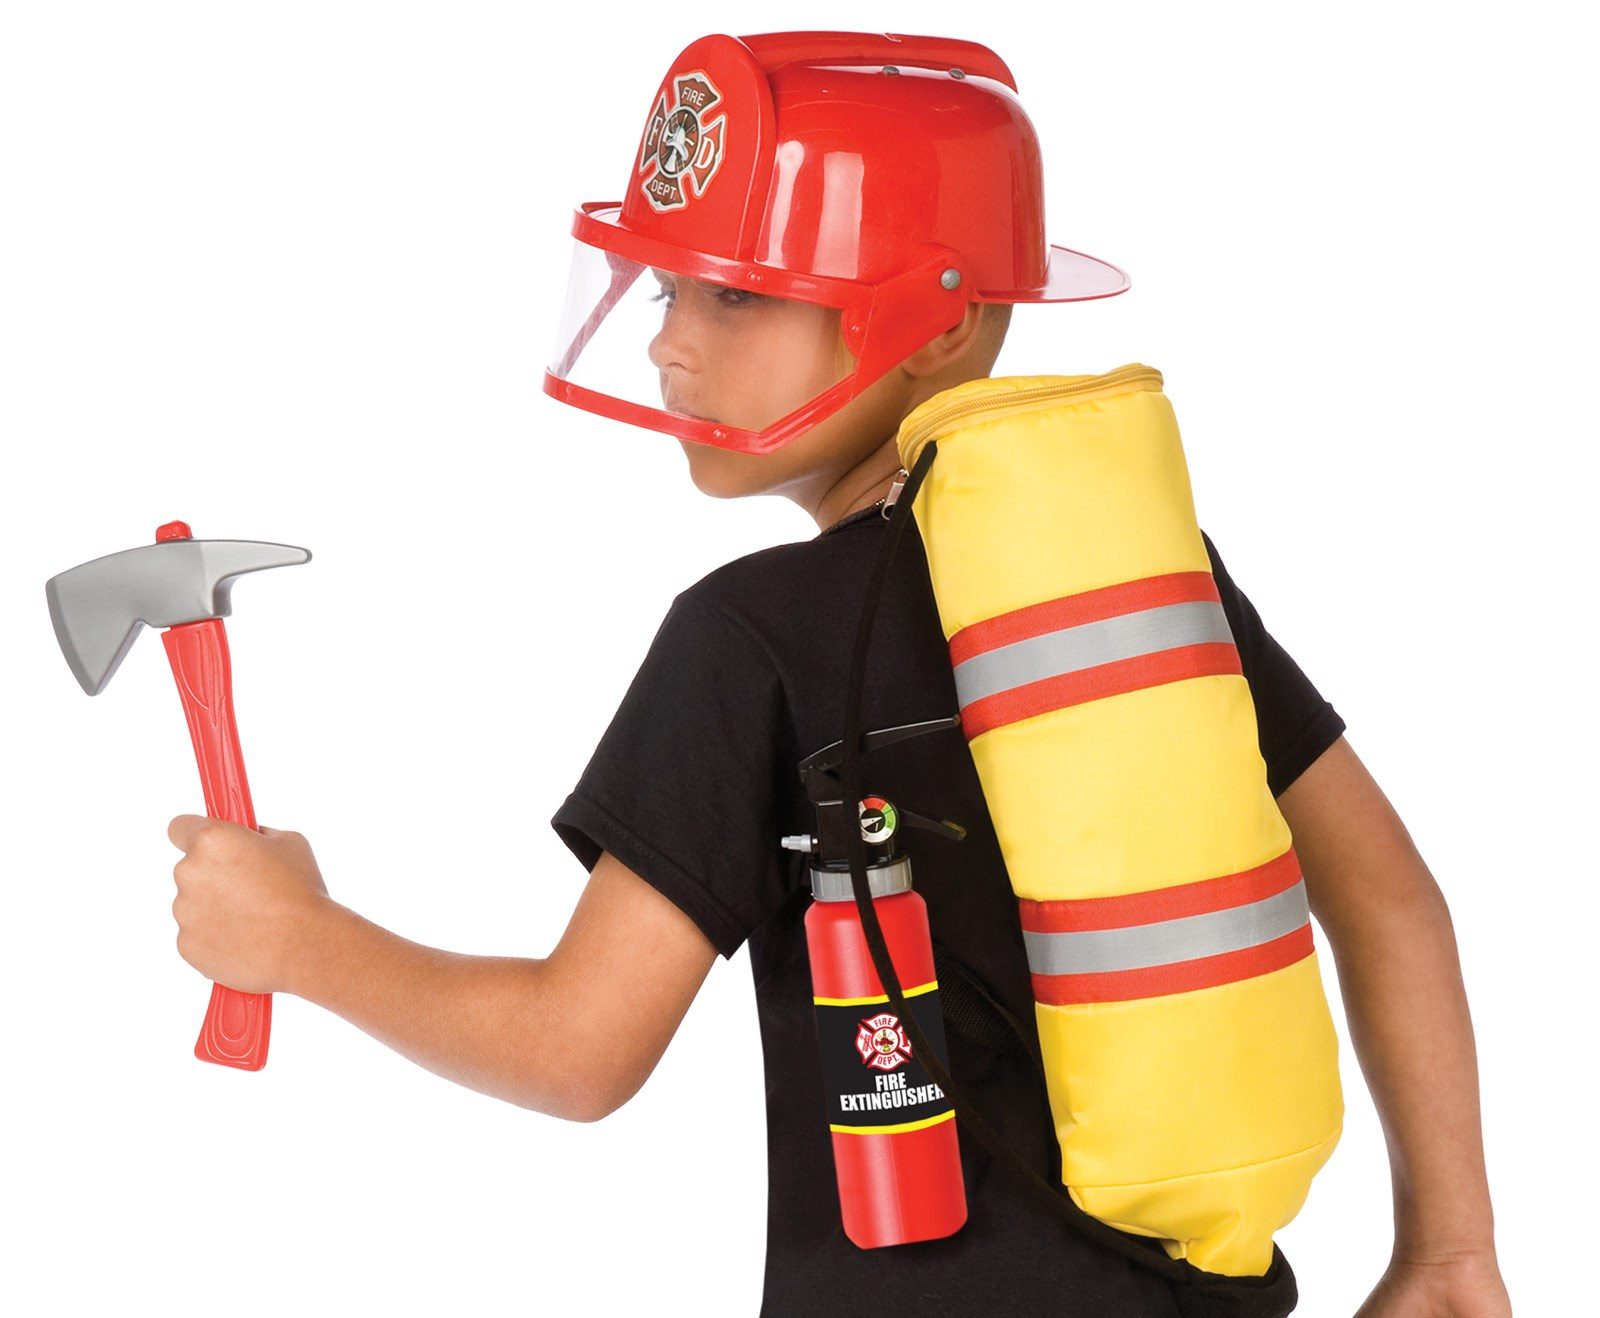 gear to go fireman adventure play set buycostumes com